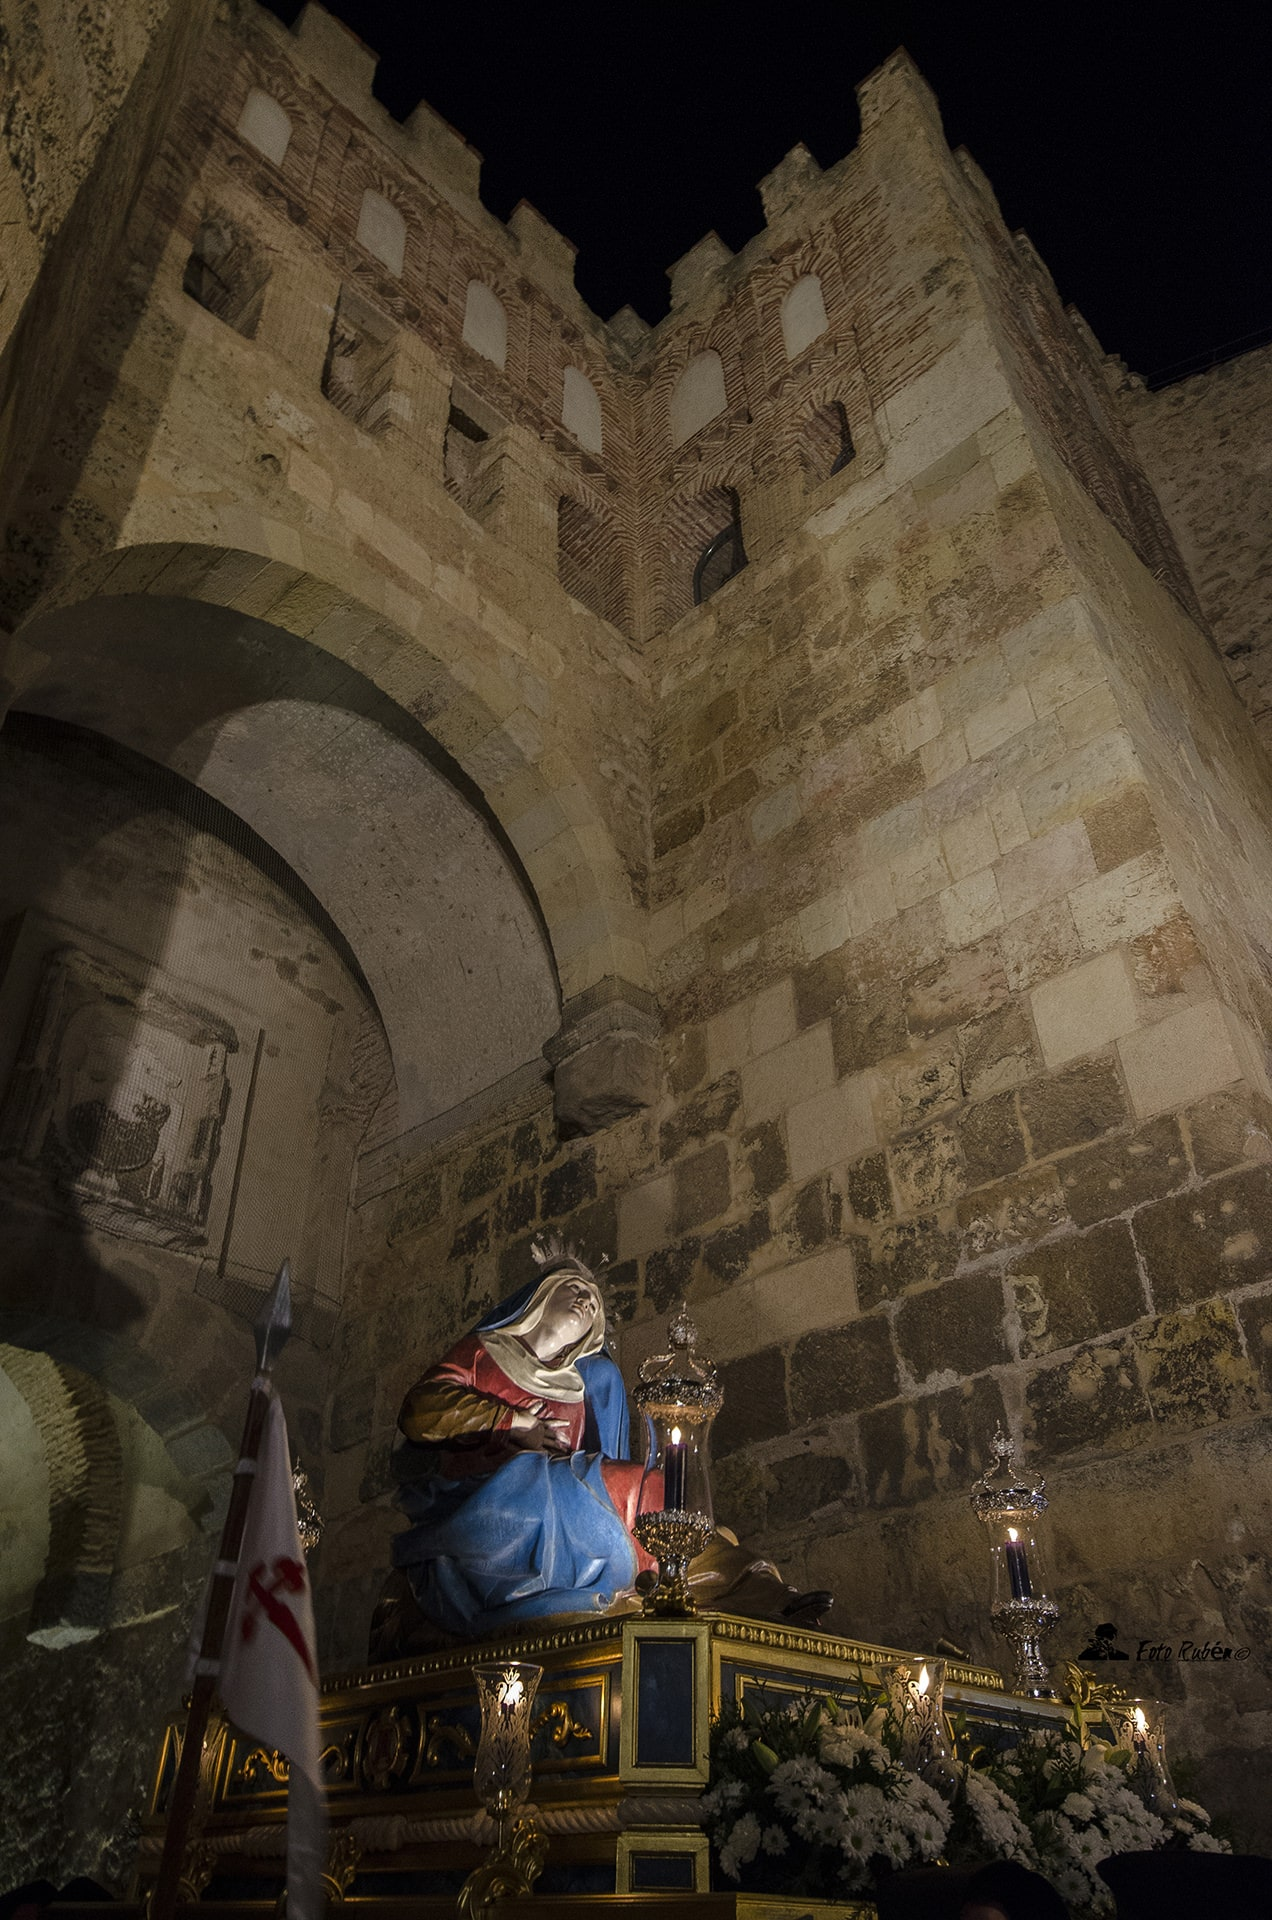 Procesion de Ntra. Madre Marçia Santismima de las Angustias, Segovia5